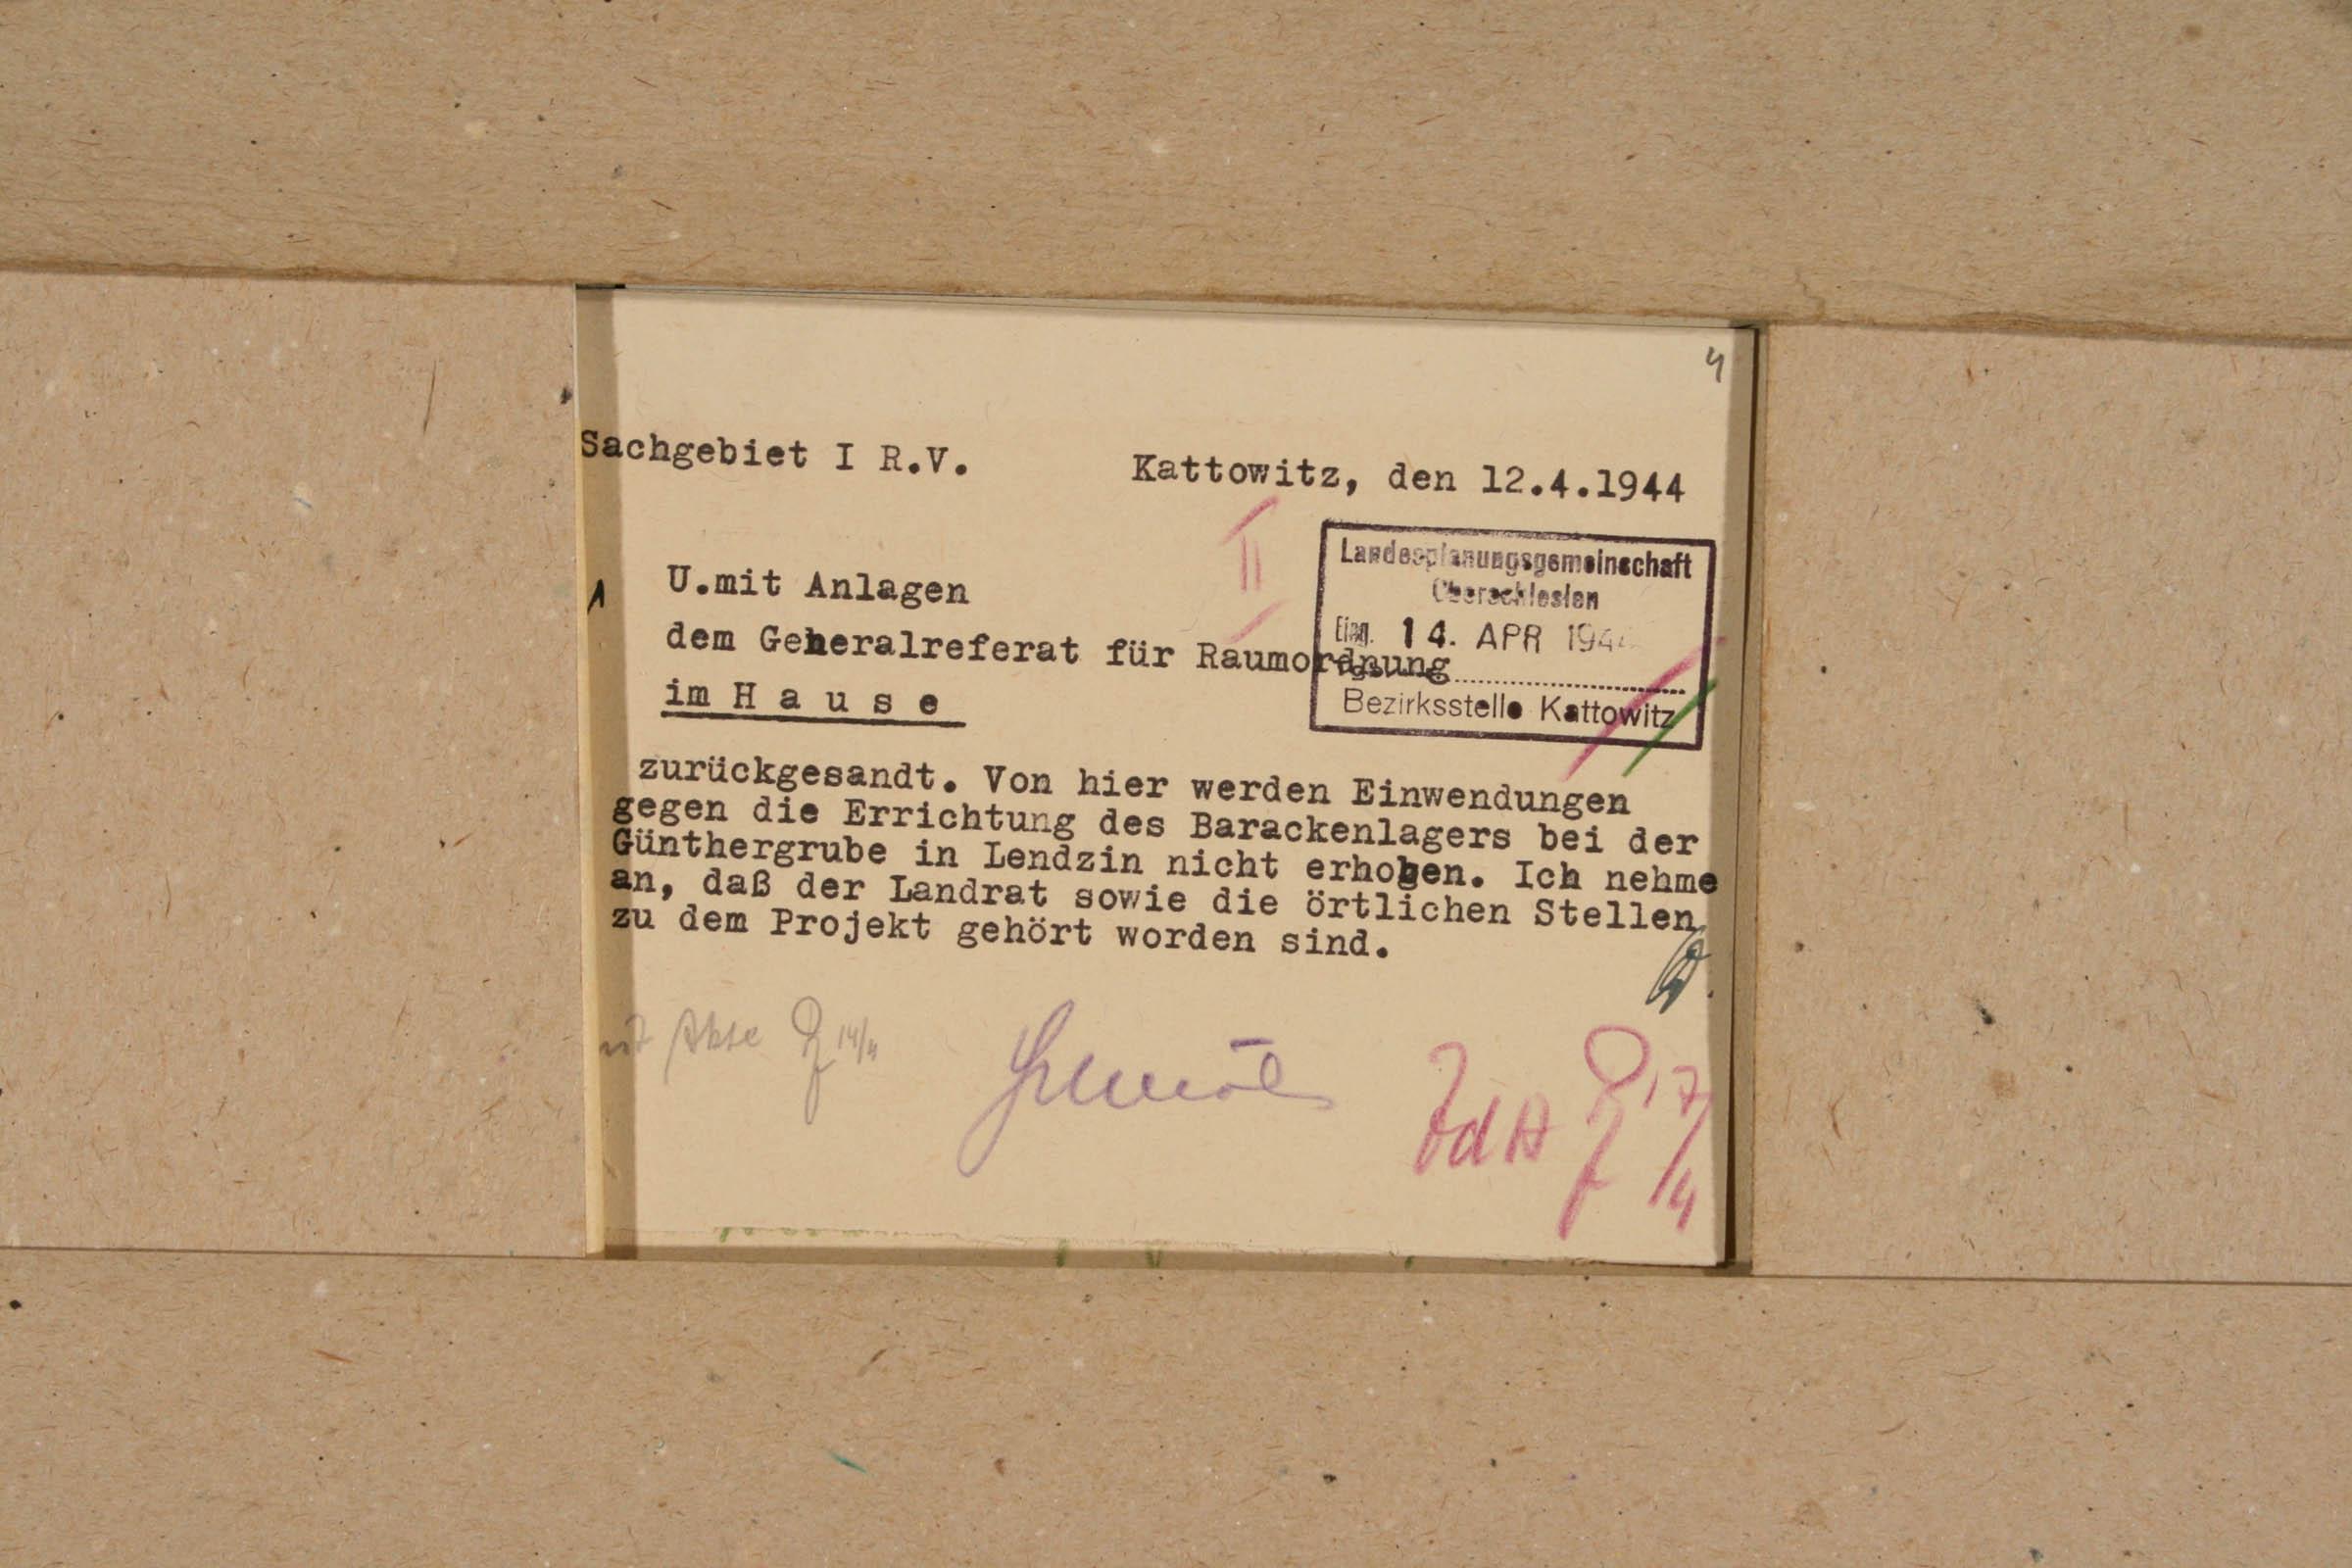 Archiwum Panstwowe w Katowicach Land Pl 12 120 708 04